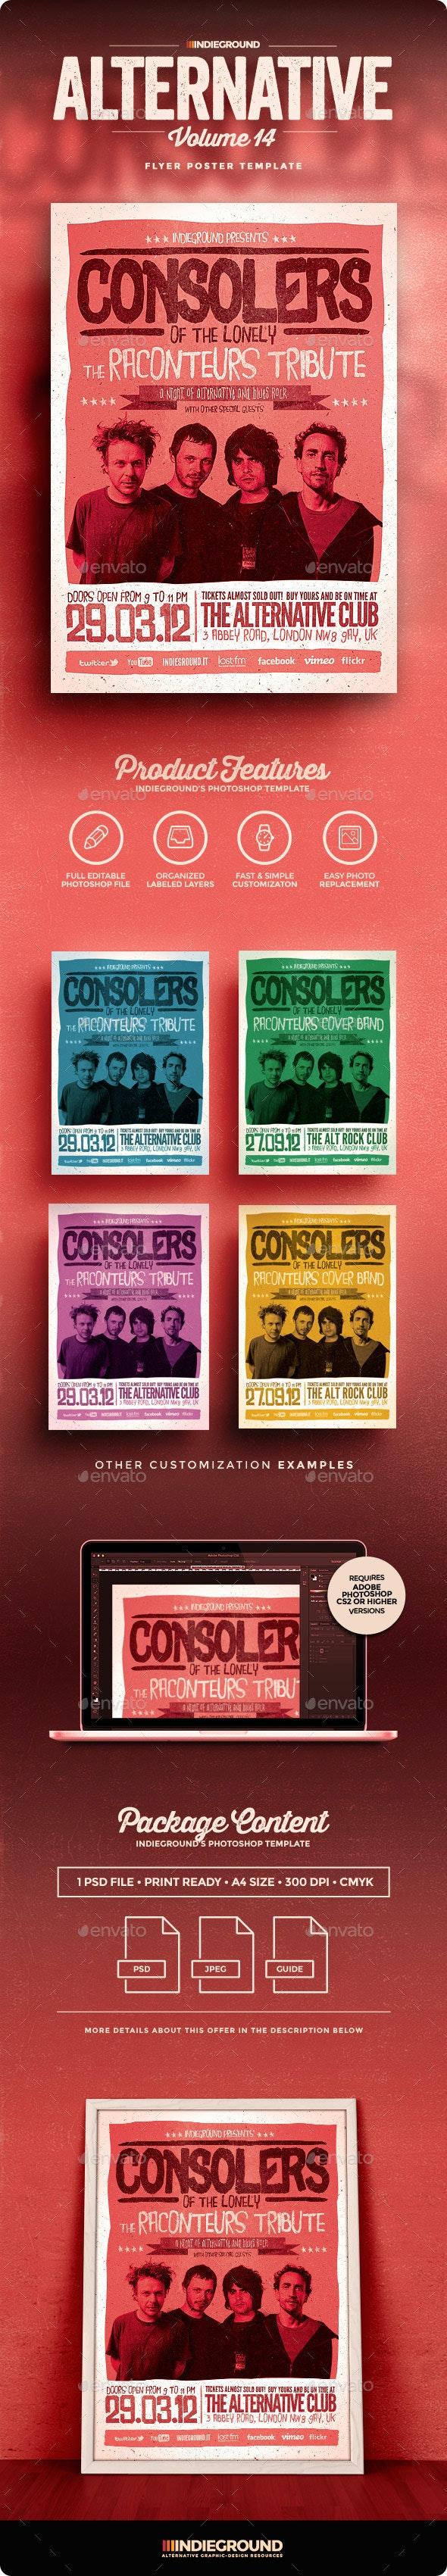 Alternative Flyer/Poster Vol. 14 - Concerts Events